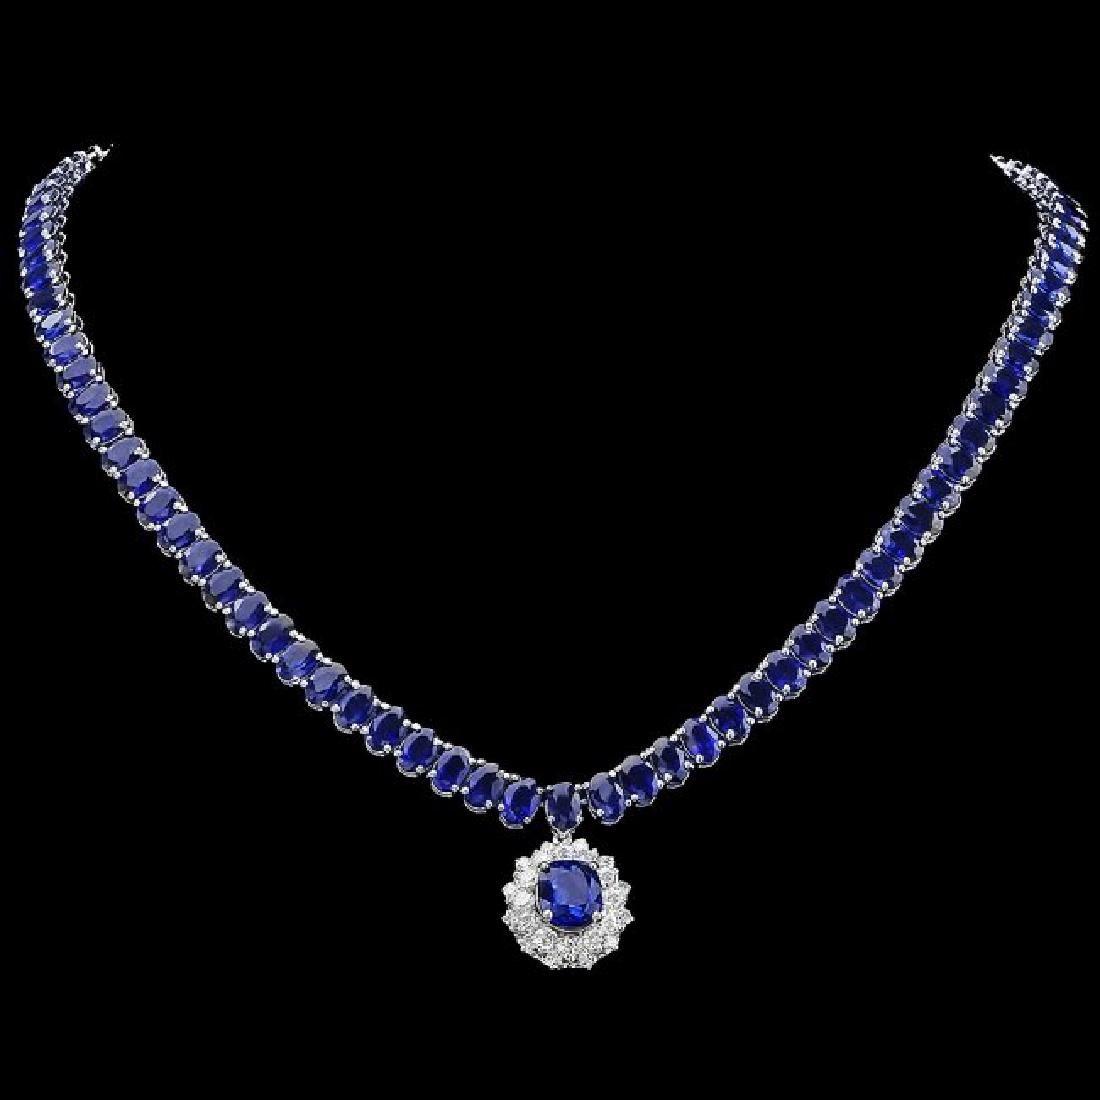 14k Gold 51.5ct Sapphire 1.55ct Diamond Necklace